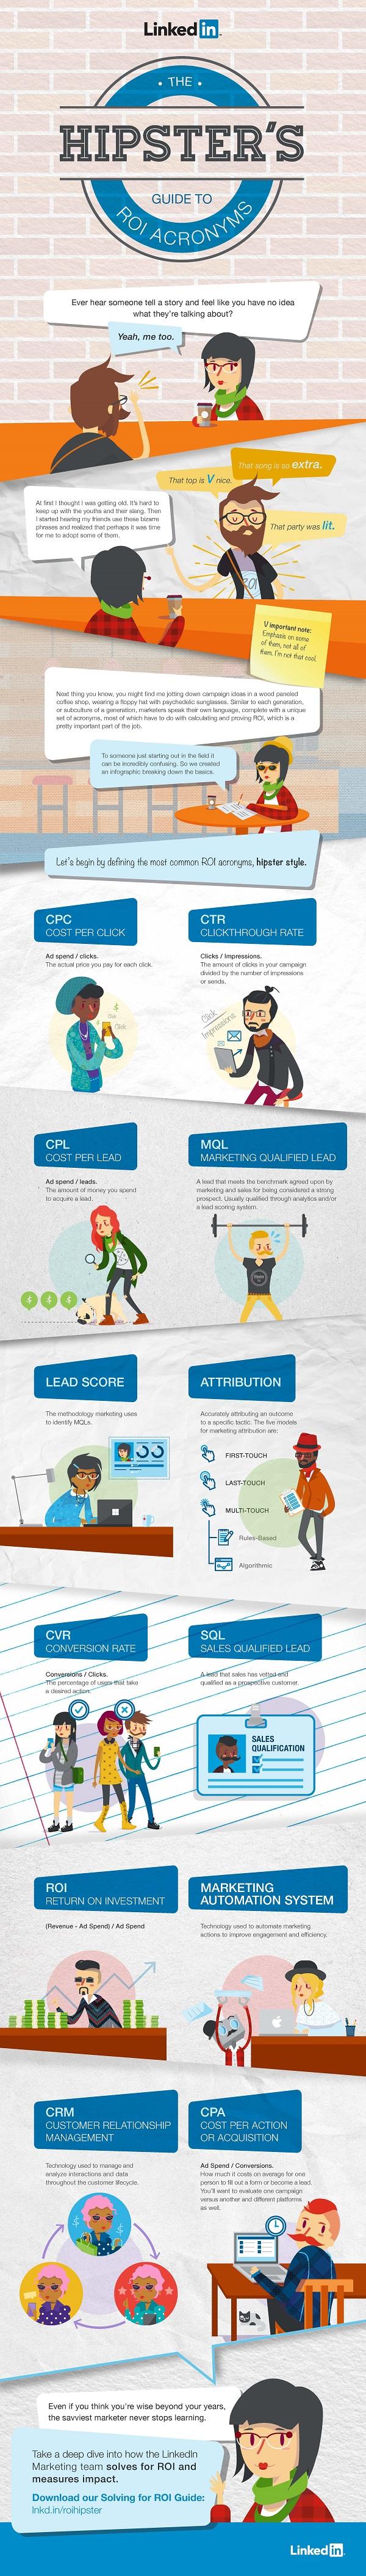 Infographic: Marketing Acronyms